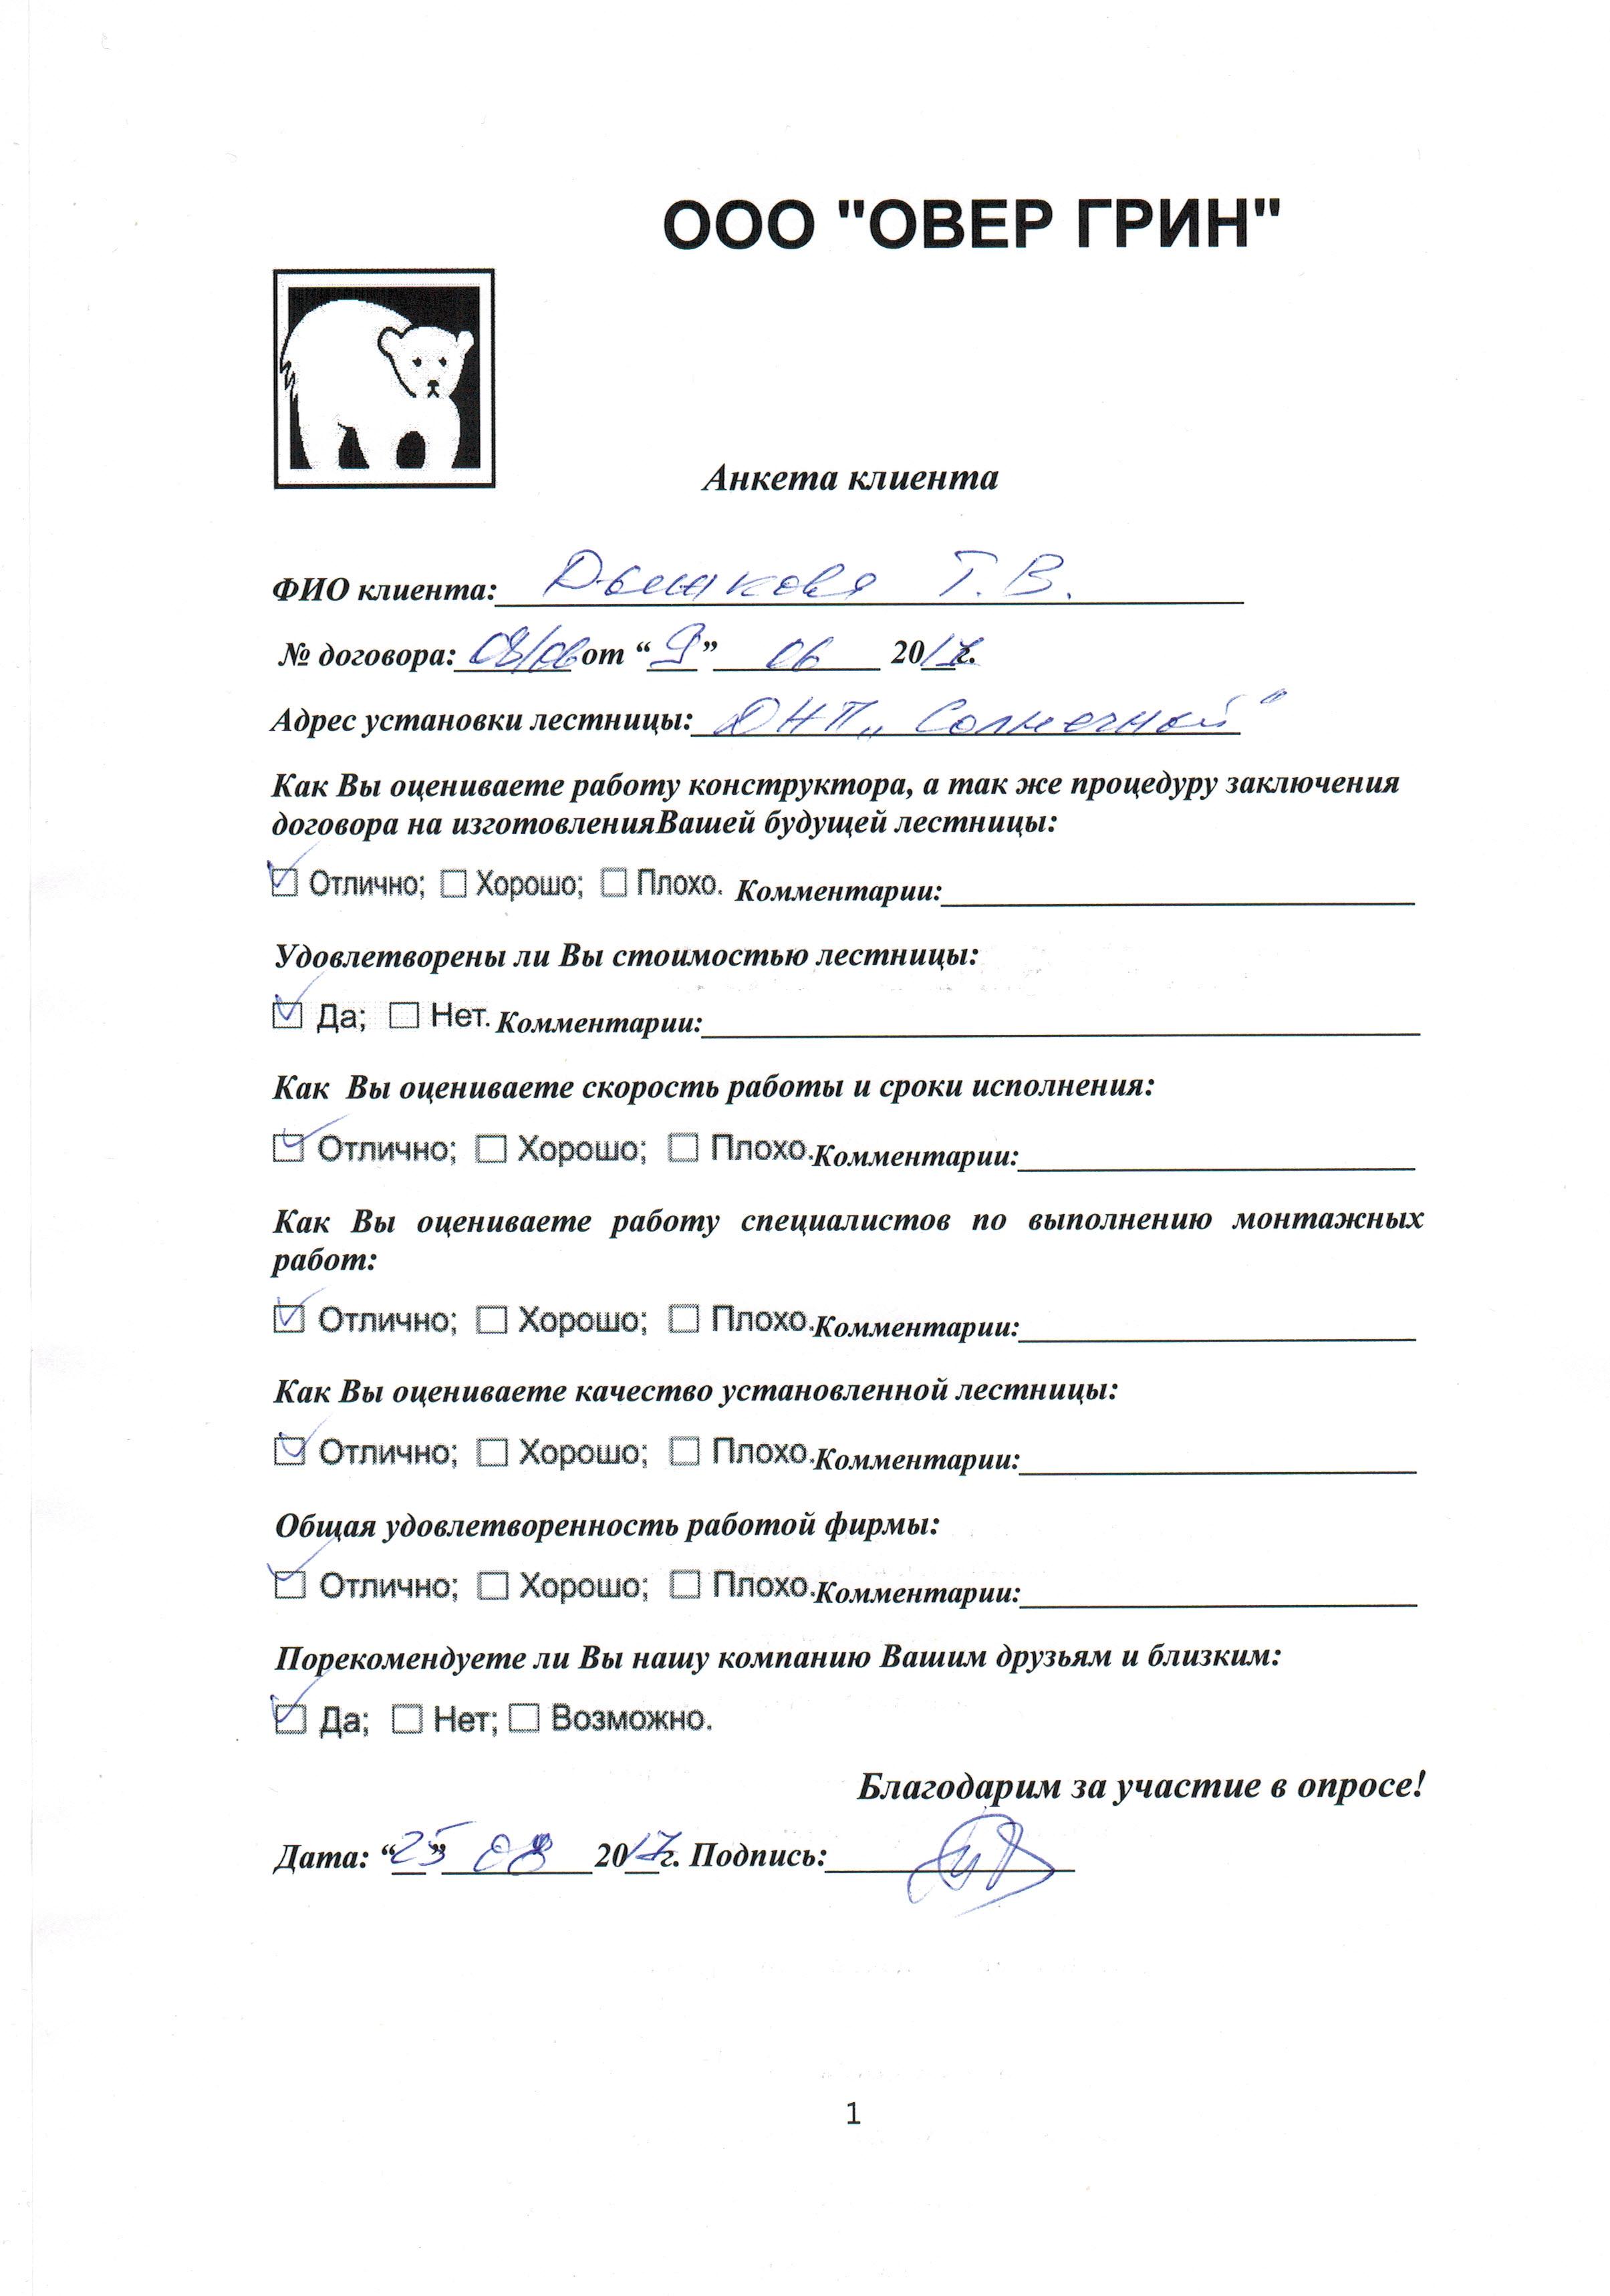 Отзыв о работе LascalaGrande.by